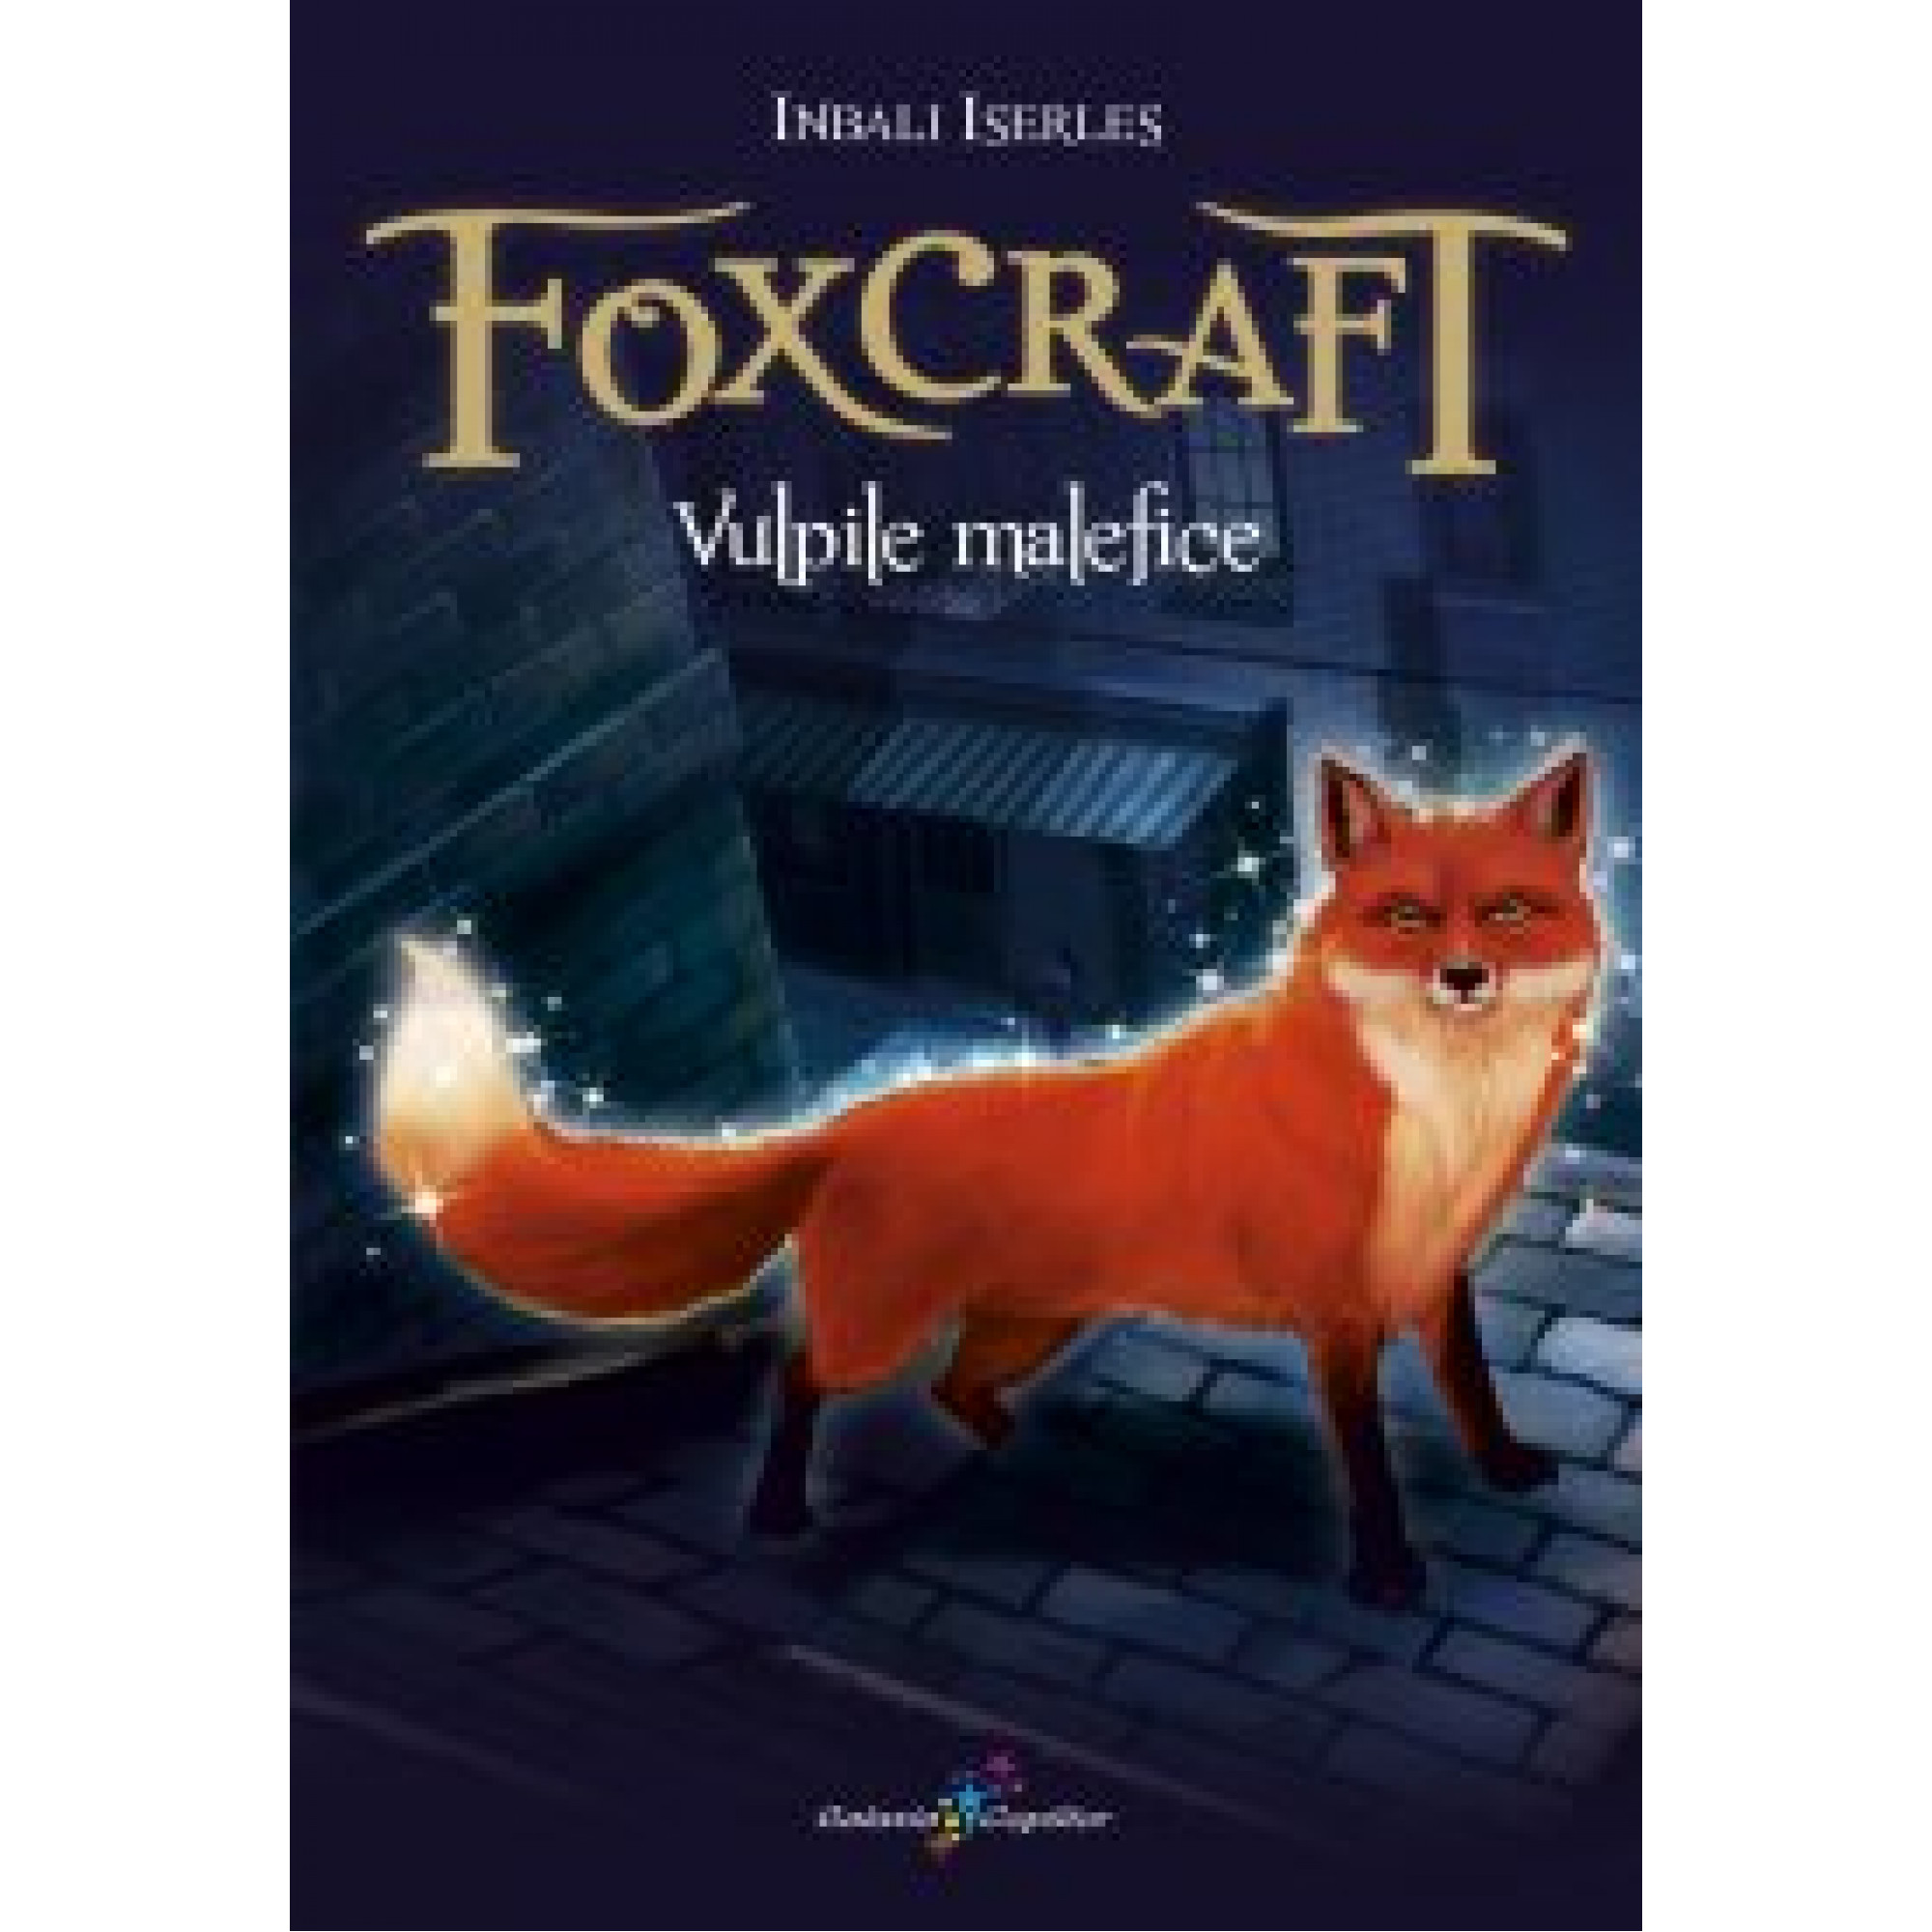 Foxcraft - Cartea I - Vulpile malefice; Inbali Iserles